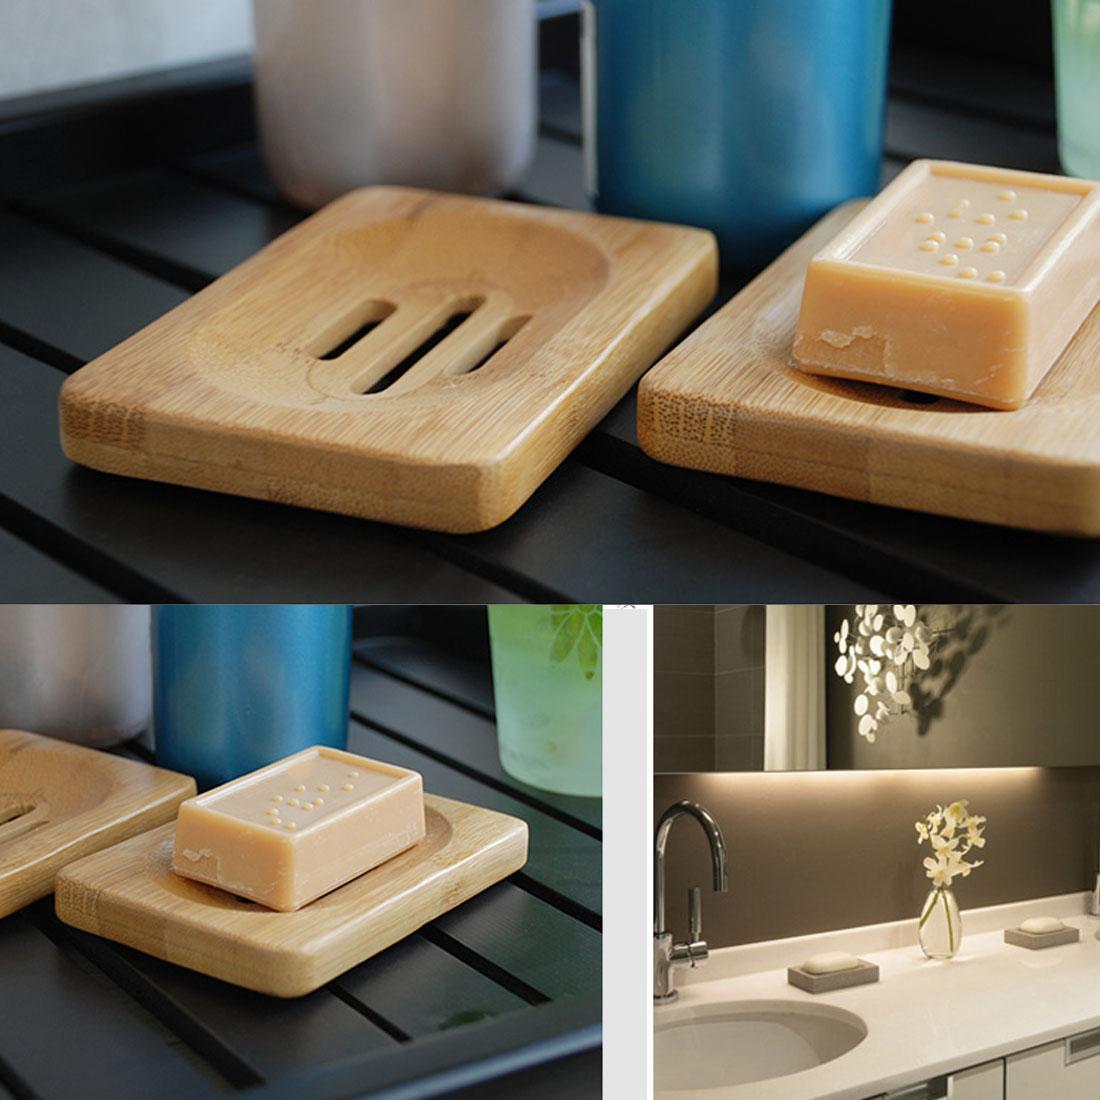 Hot Sale Natural Bamboo Wood Soap Dish Storage Holder Bath Shower Plate Bathroom